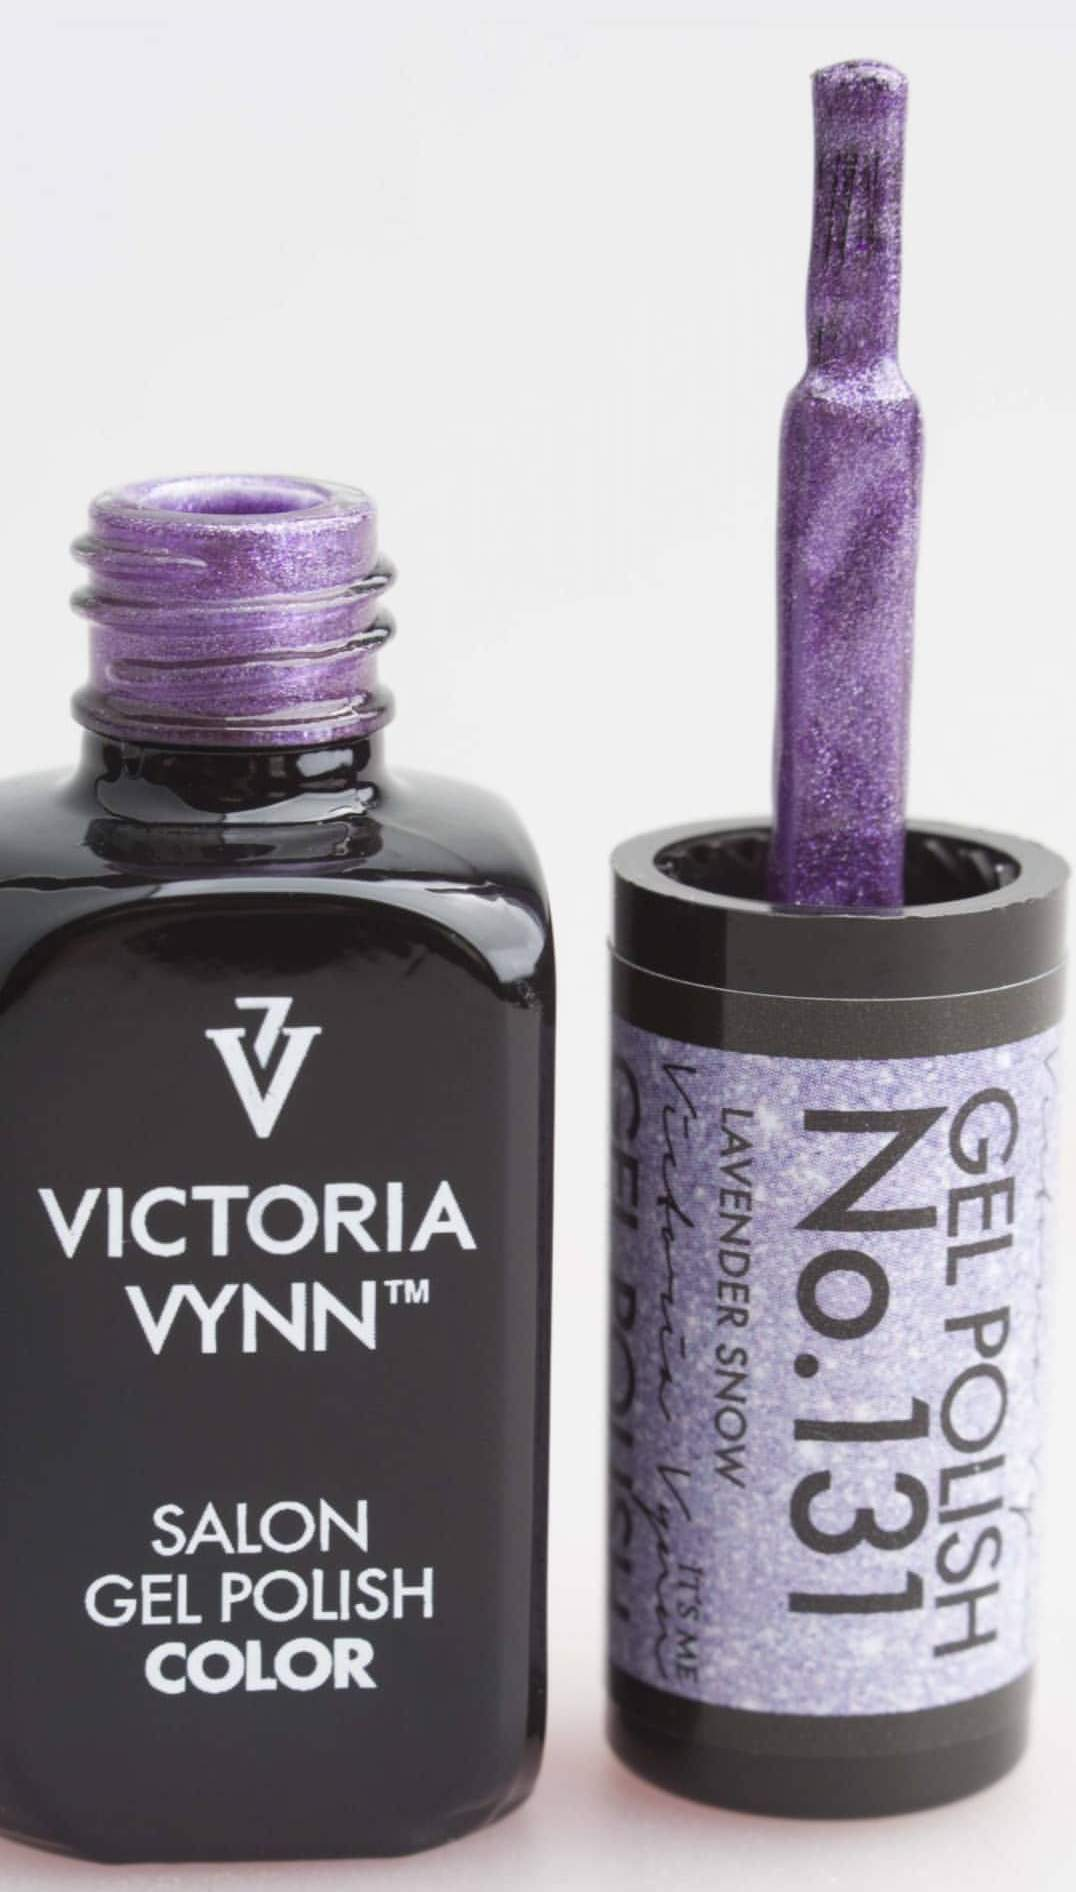 Victoria Vynn Verniz Gel Nº 131 - Lavender Snow - 8 ml